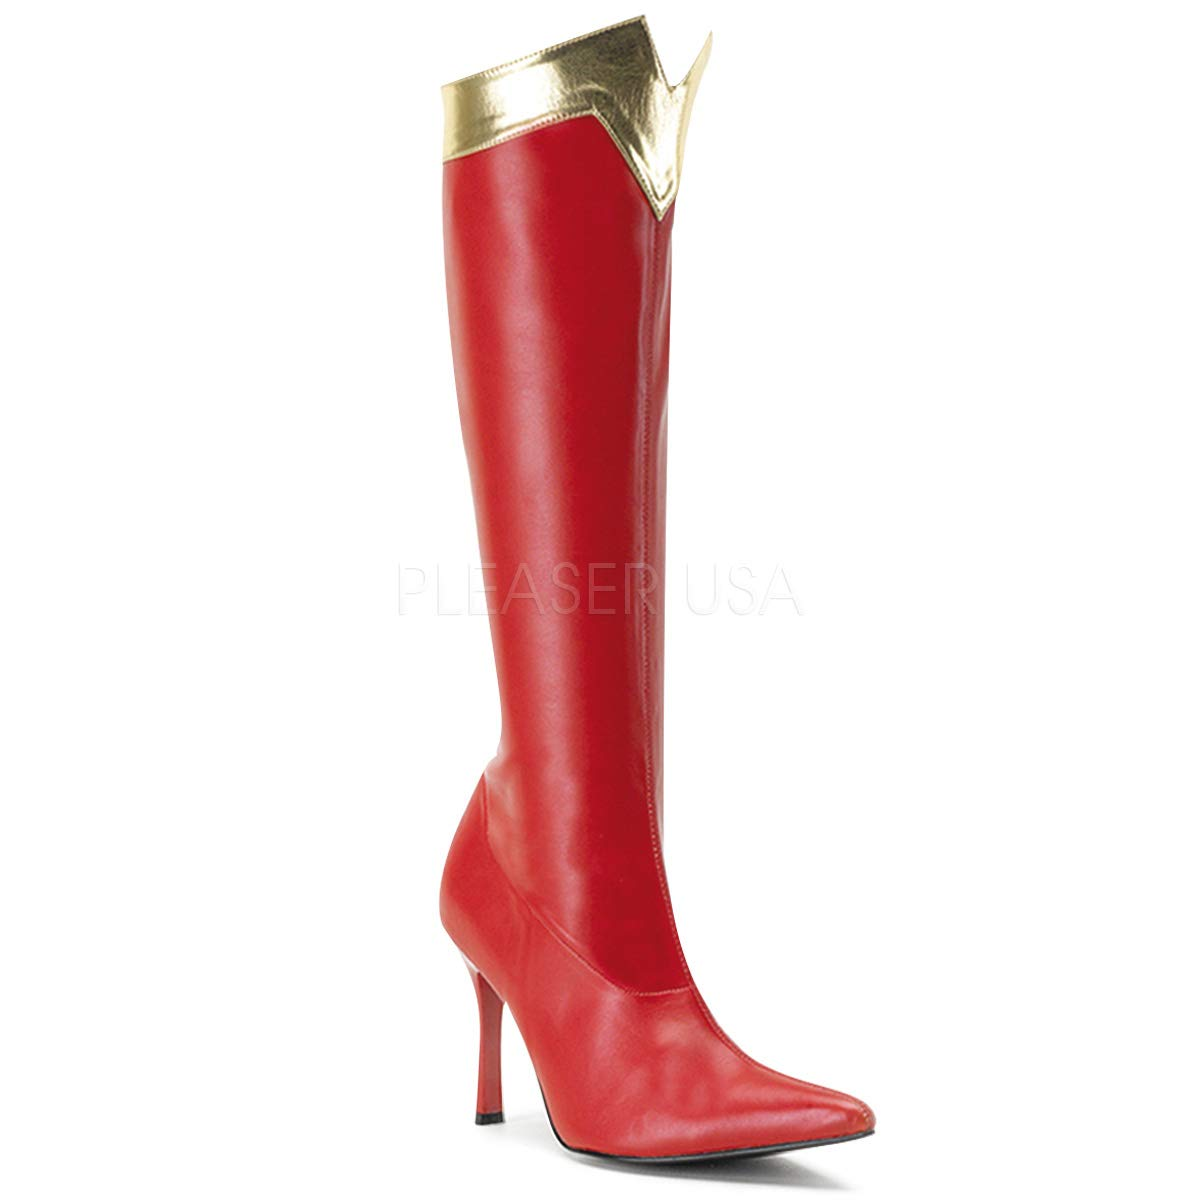 Funtasma by Pleaser Women's Wonder-130 Knee-High Boot,Red/Gold Str. Pu,9 M US by Funtasma